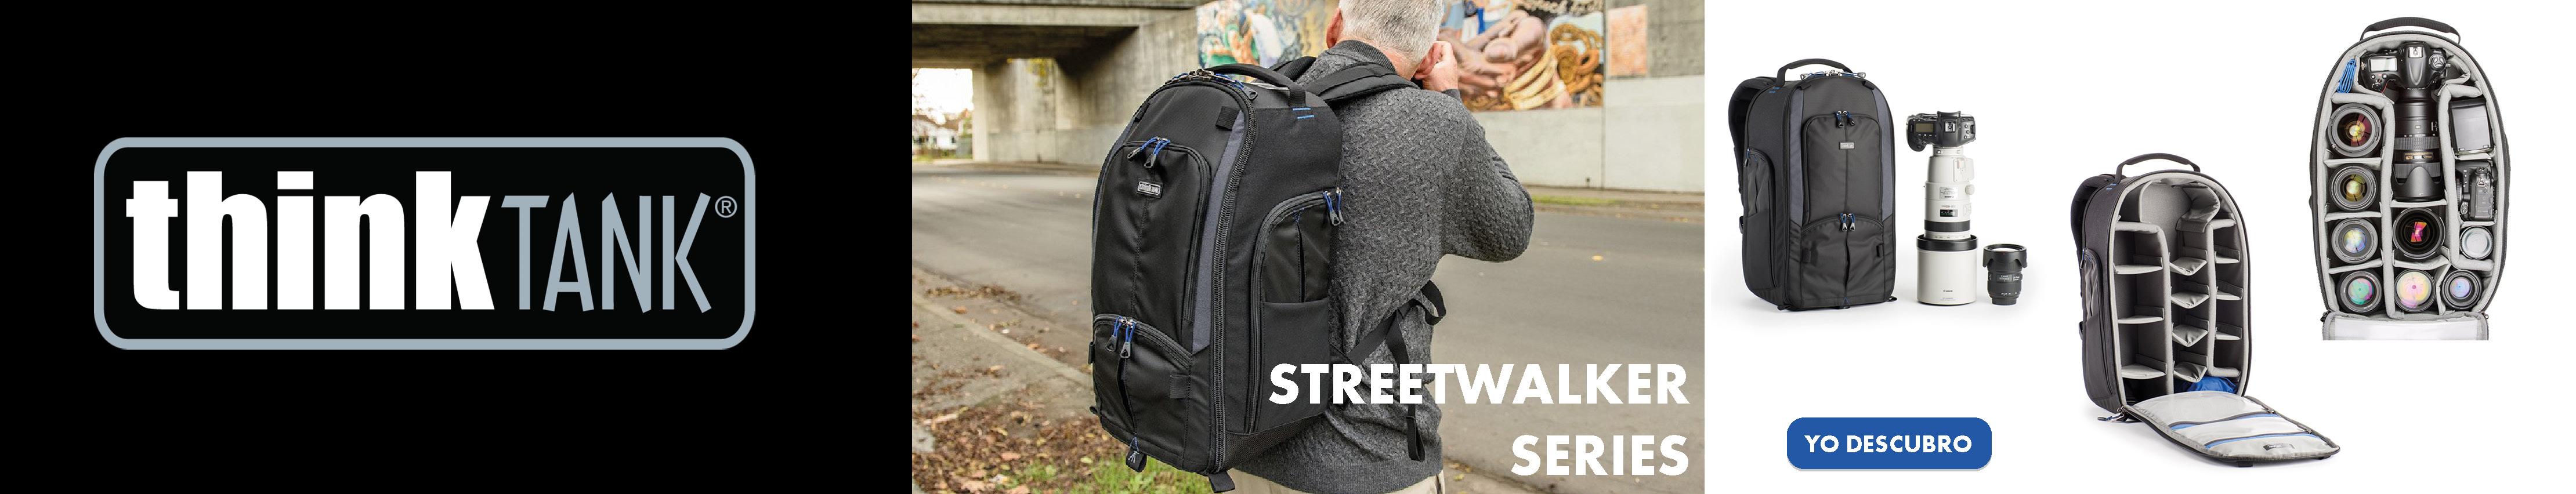 STREETWALKER SERIES